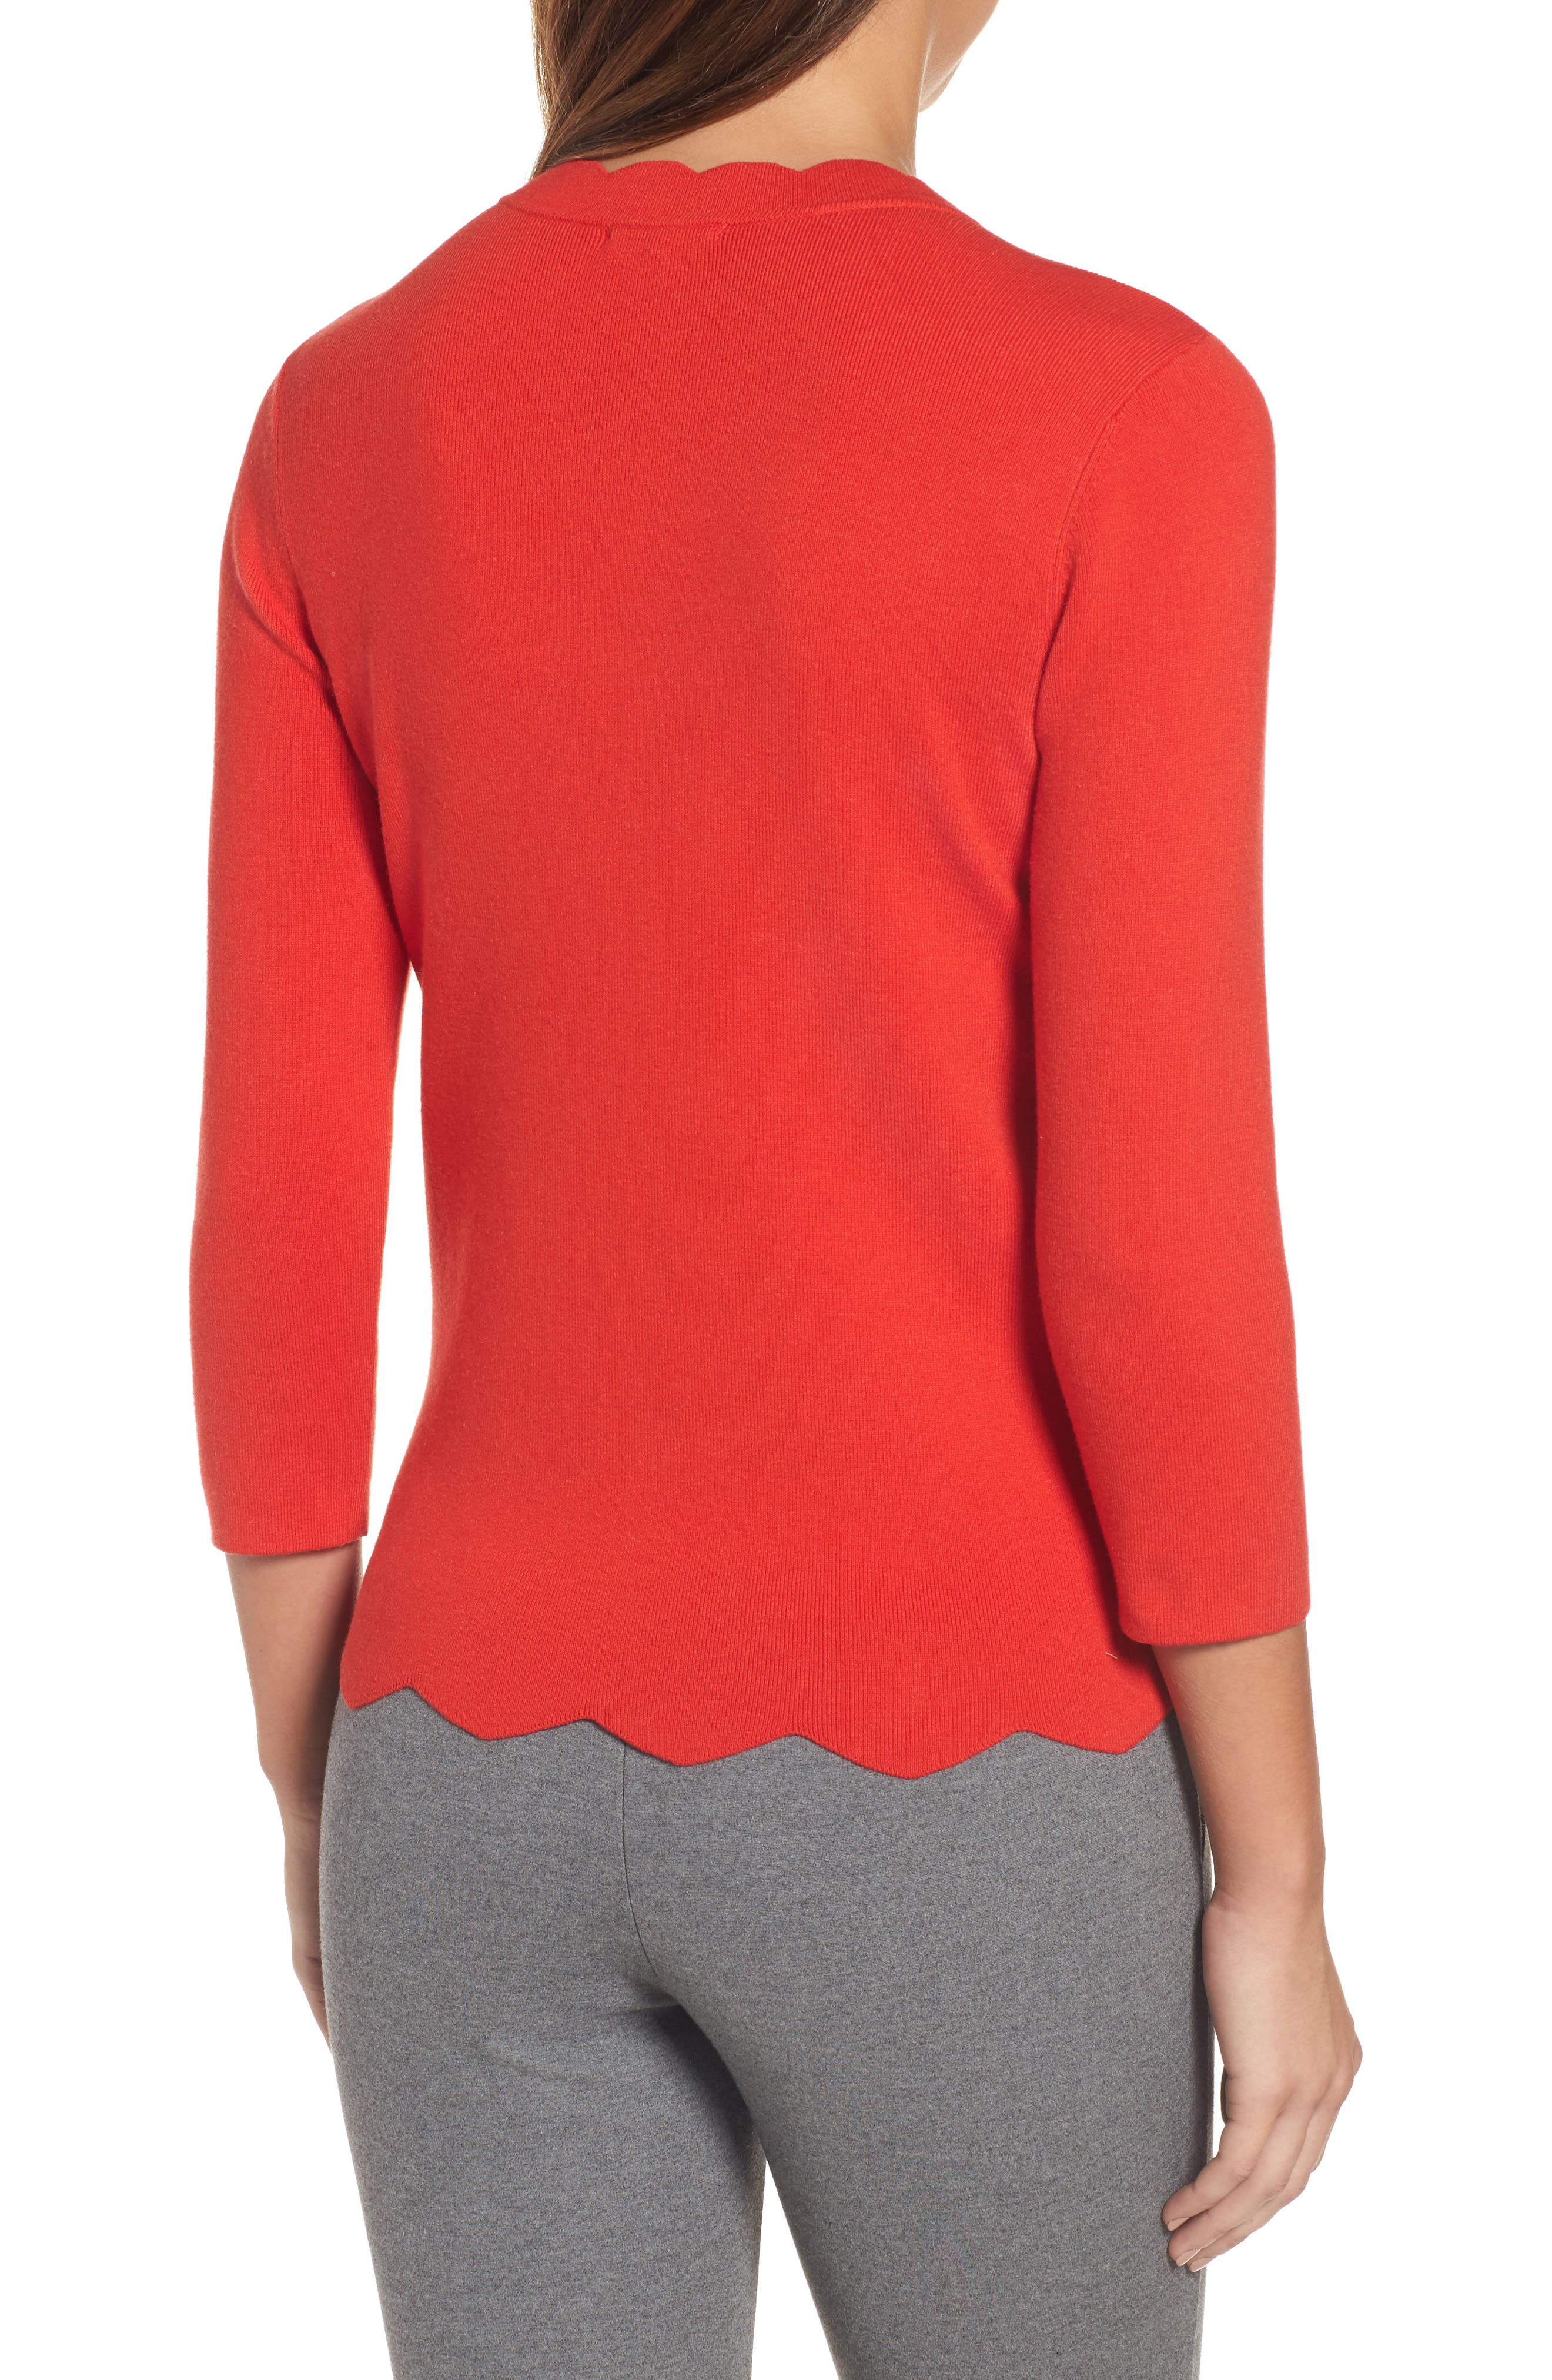 Alternate Image 3  - Halogen Scallop Edge Sweater (Regular & Petite)